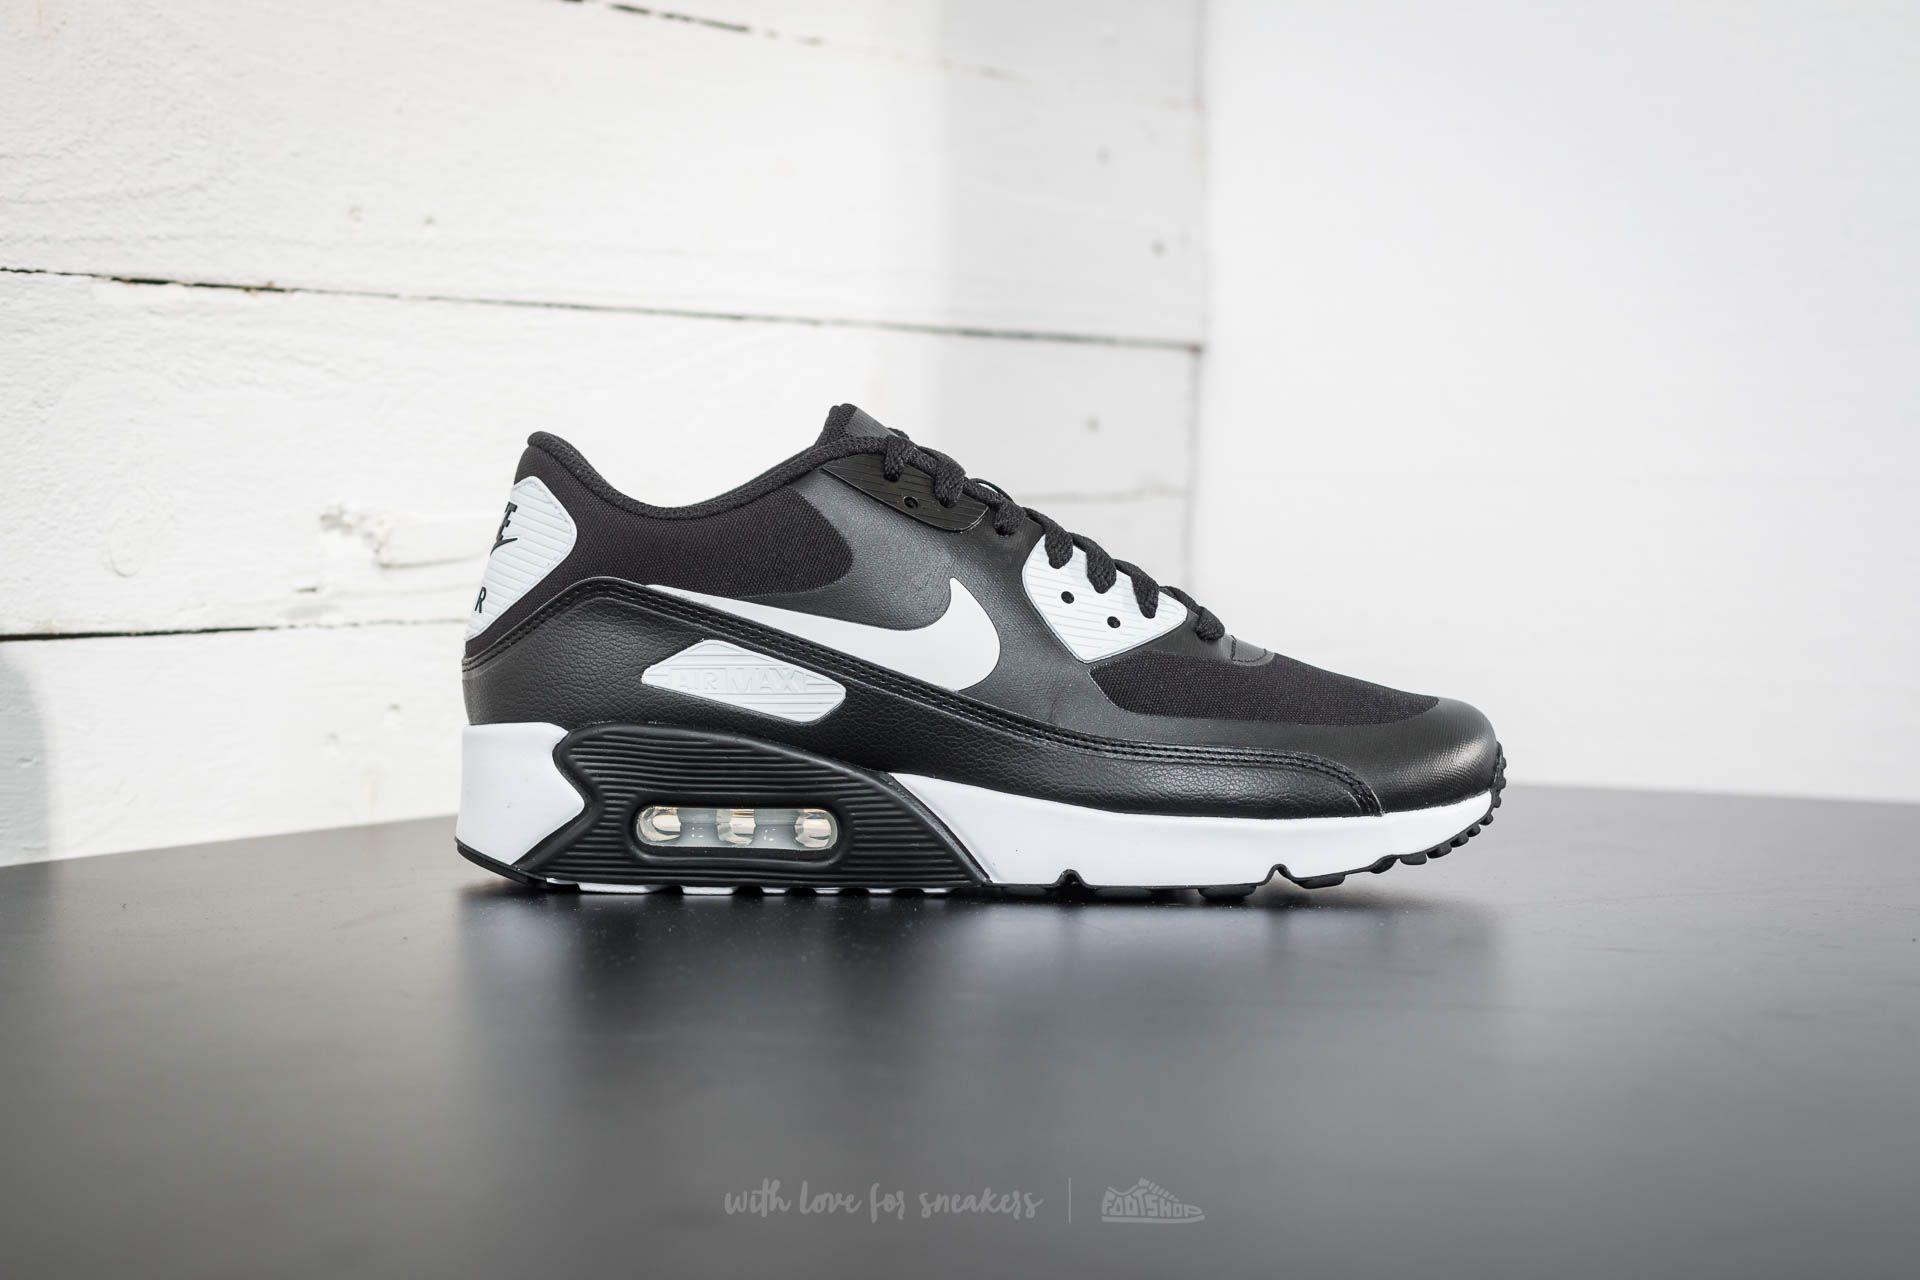 Nike Sportswear Schuh Air Max 90 Ultra 2.0 Essential Black